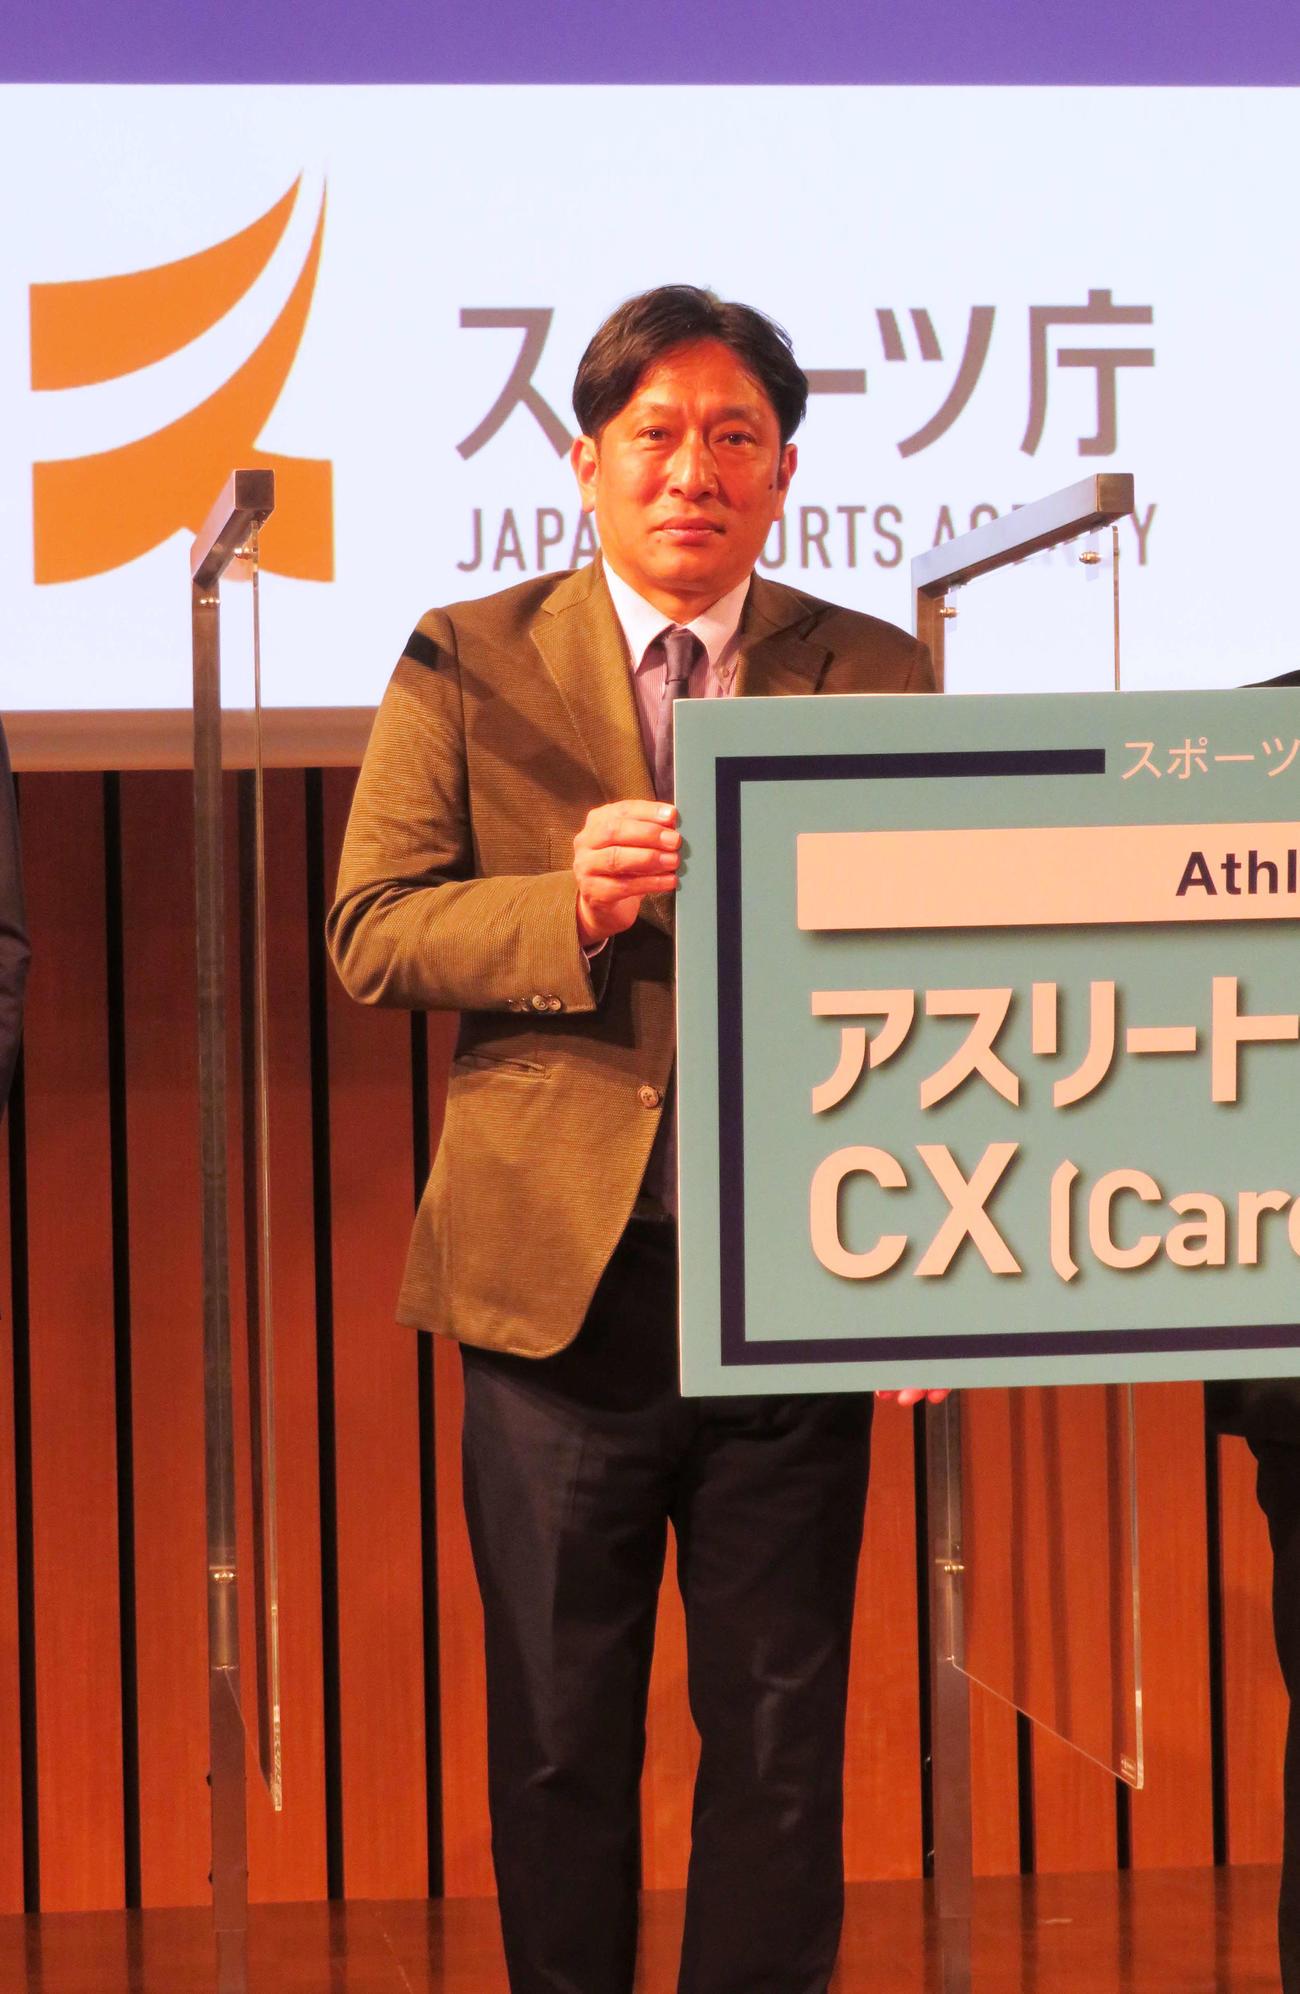 「Athlete Career Challenge カンファレンス 2021」に登壇した青学大陸上部の原監督(撮影・上田悠太)